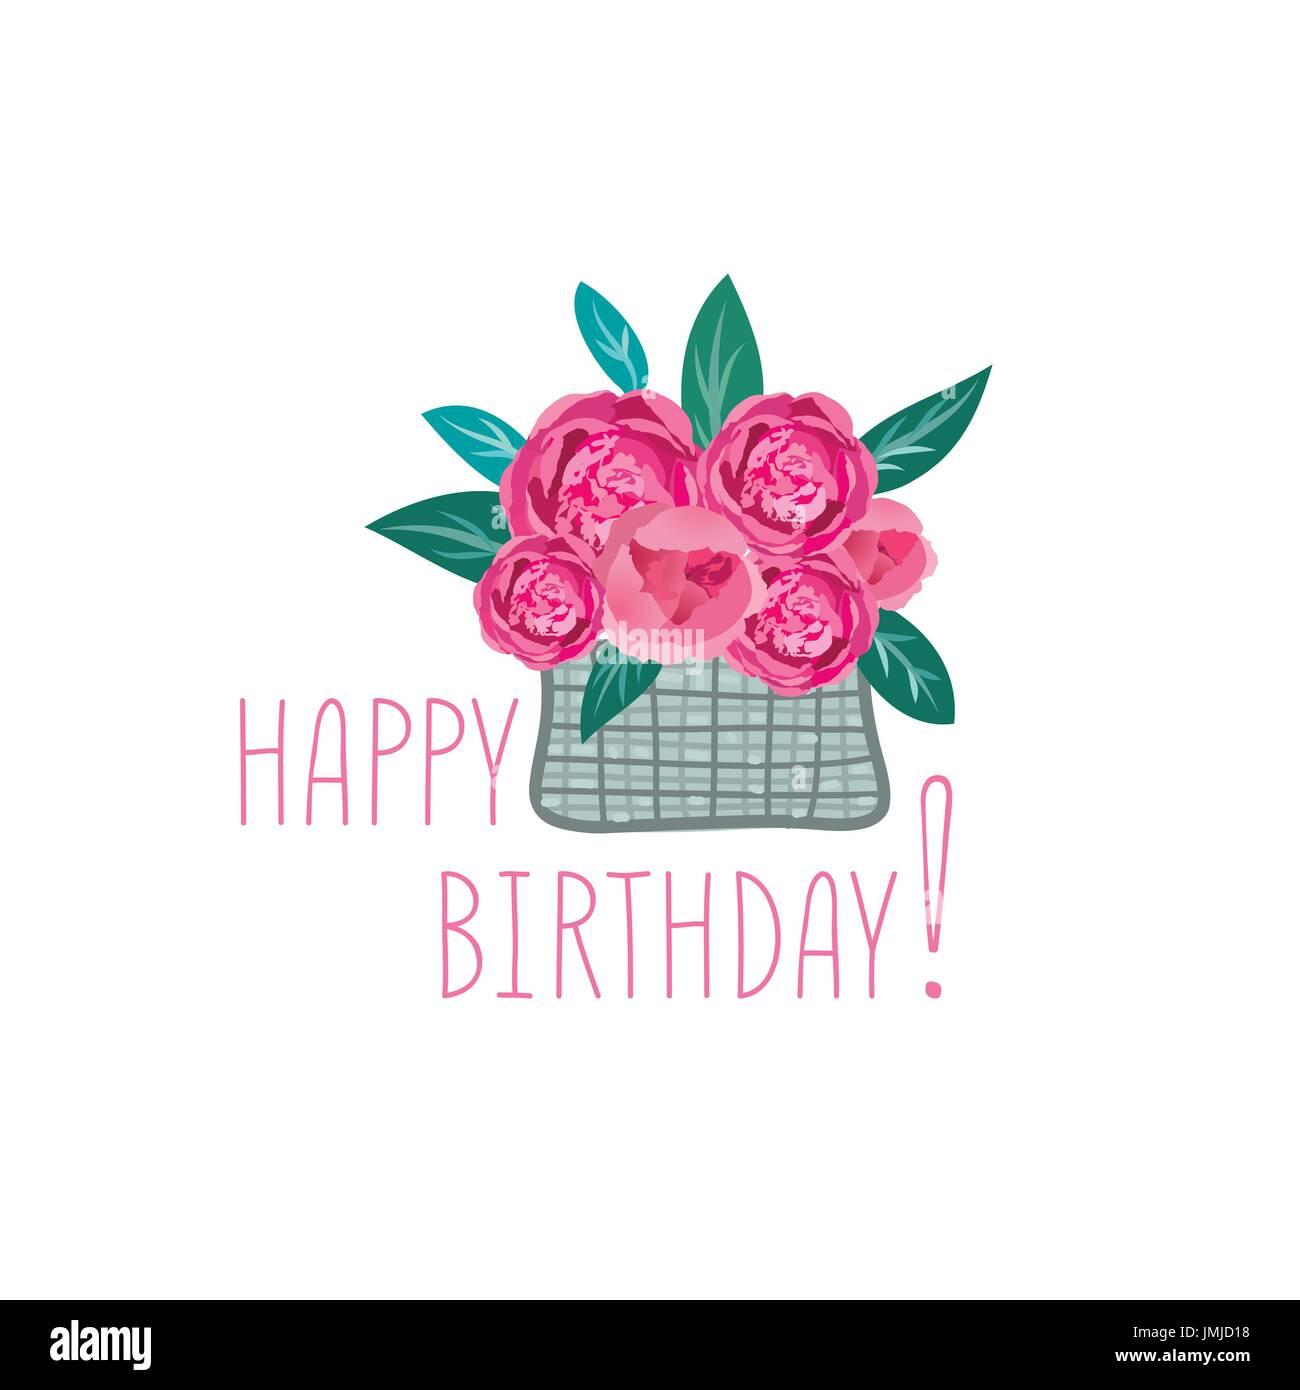 Flower In Basket Happy Birthday Greeting Card Floral Gift Summer